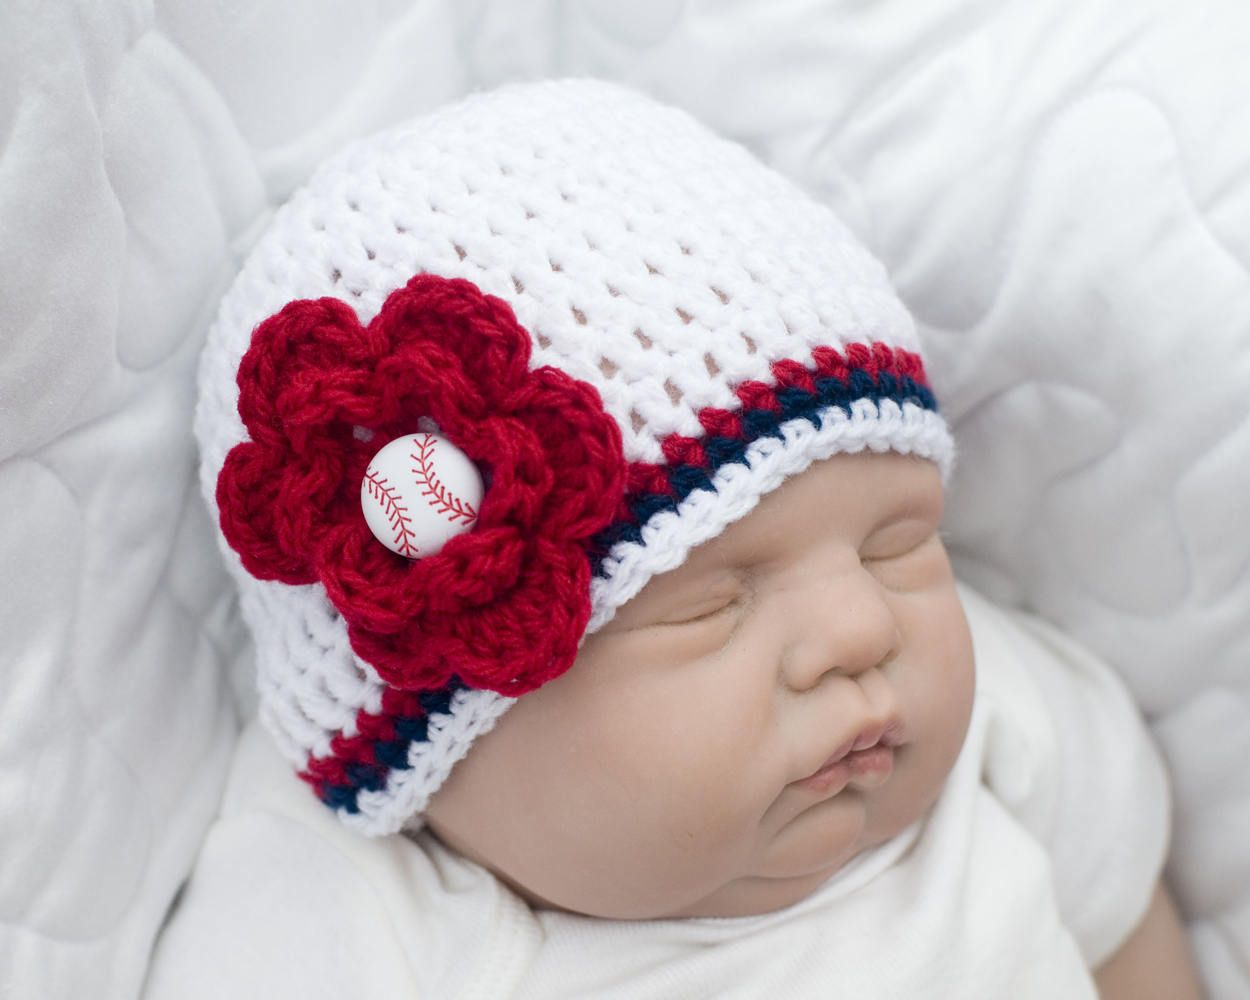 Baby Girl Baseball Crochet Baseball Hat Crochet Baby Girl Clothes Coming Home Outfit Baby Baseball Hat Baseball Gifts Red White Blue Crochet Baby Crochet Baby Clothes Crochet Baby Outfits Girl